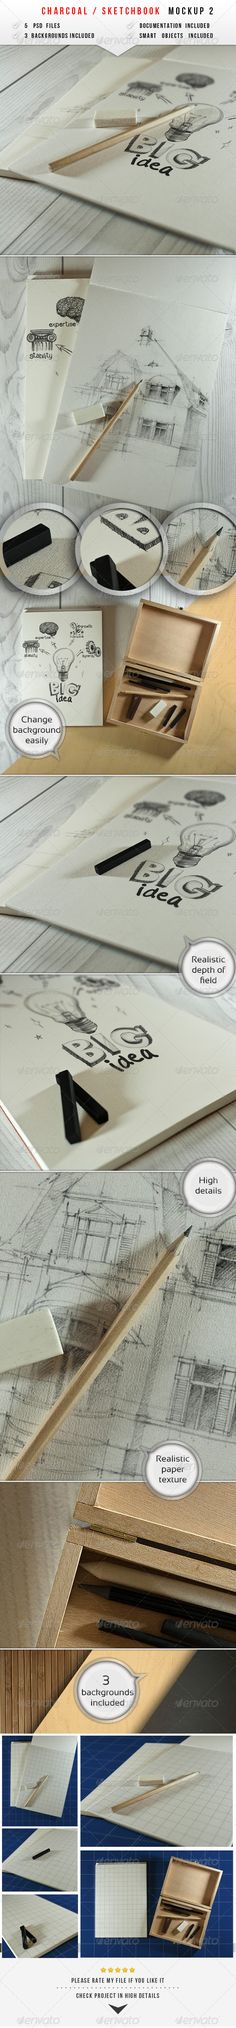 Sketch & Charcoal Mockup 2